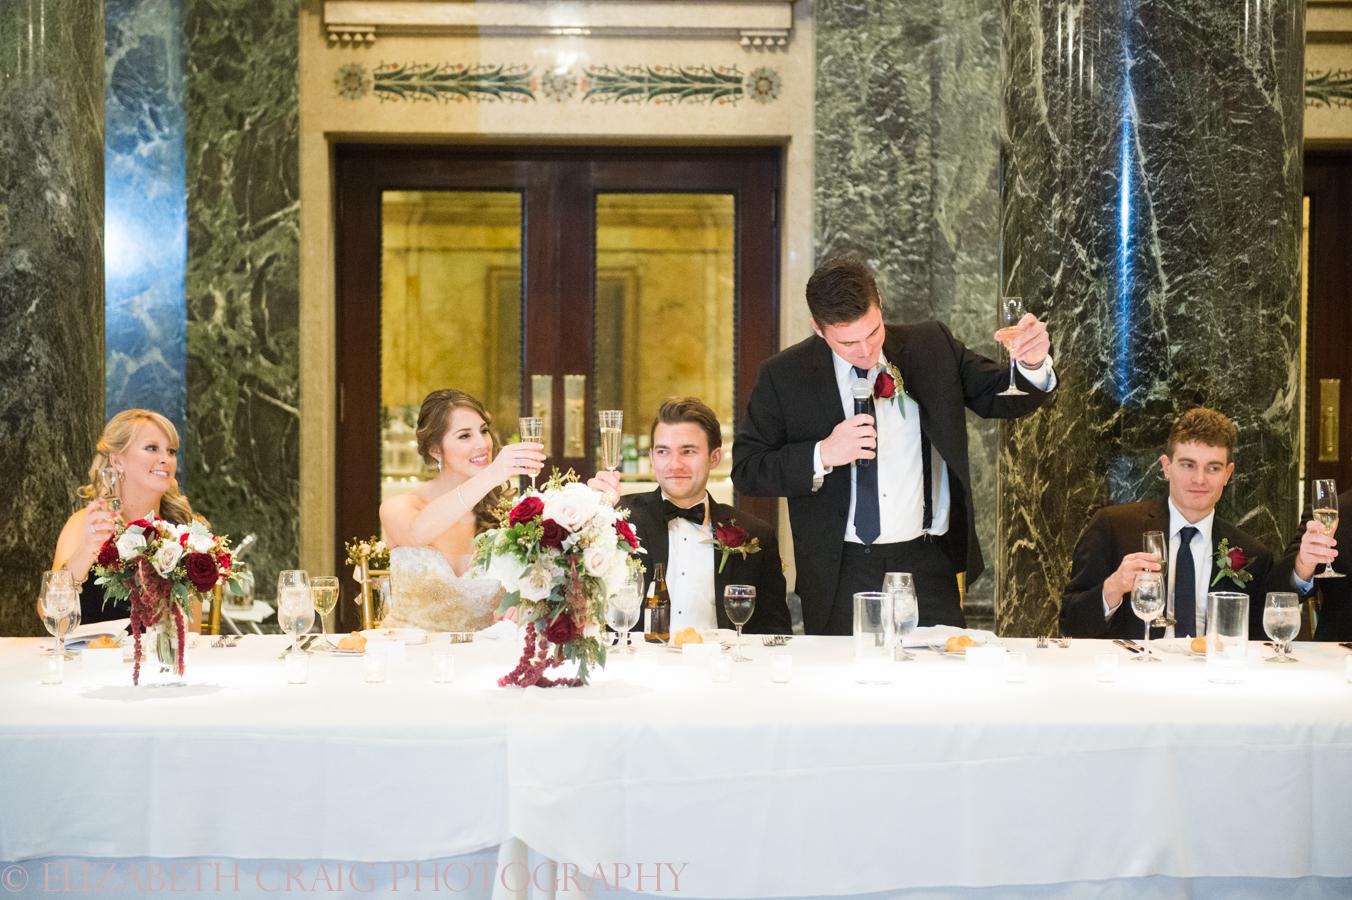 Carnegie Museum of Art Weddings | Elizabeth Craig Photography-0121